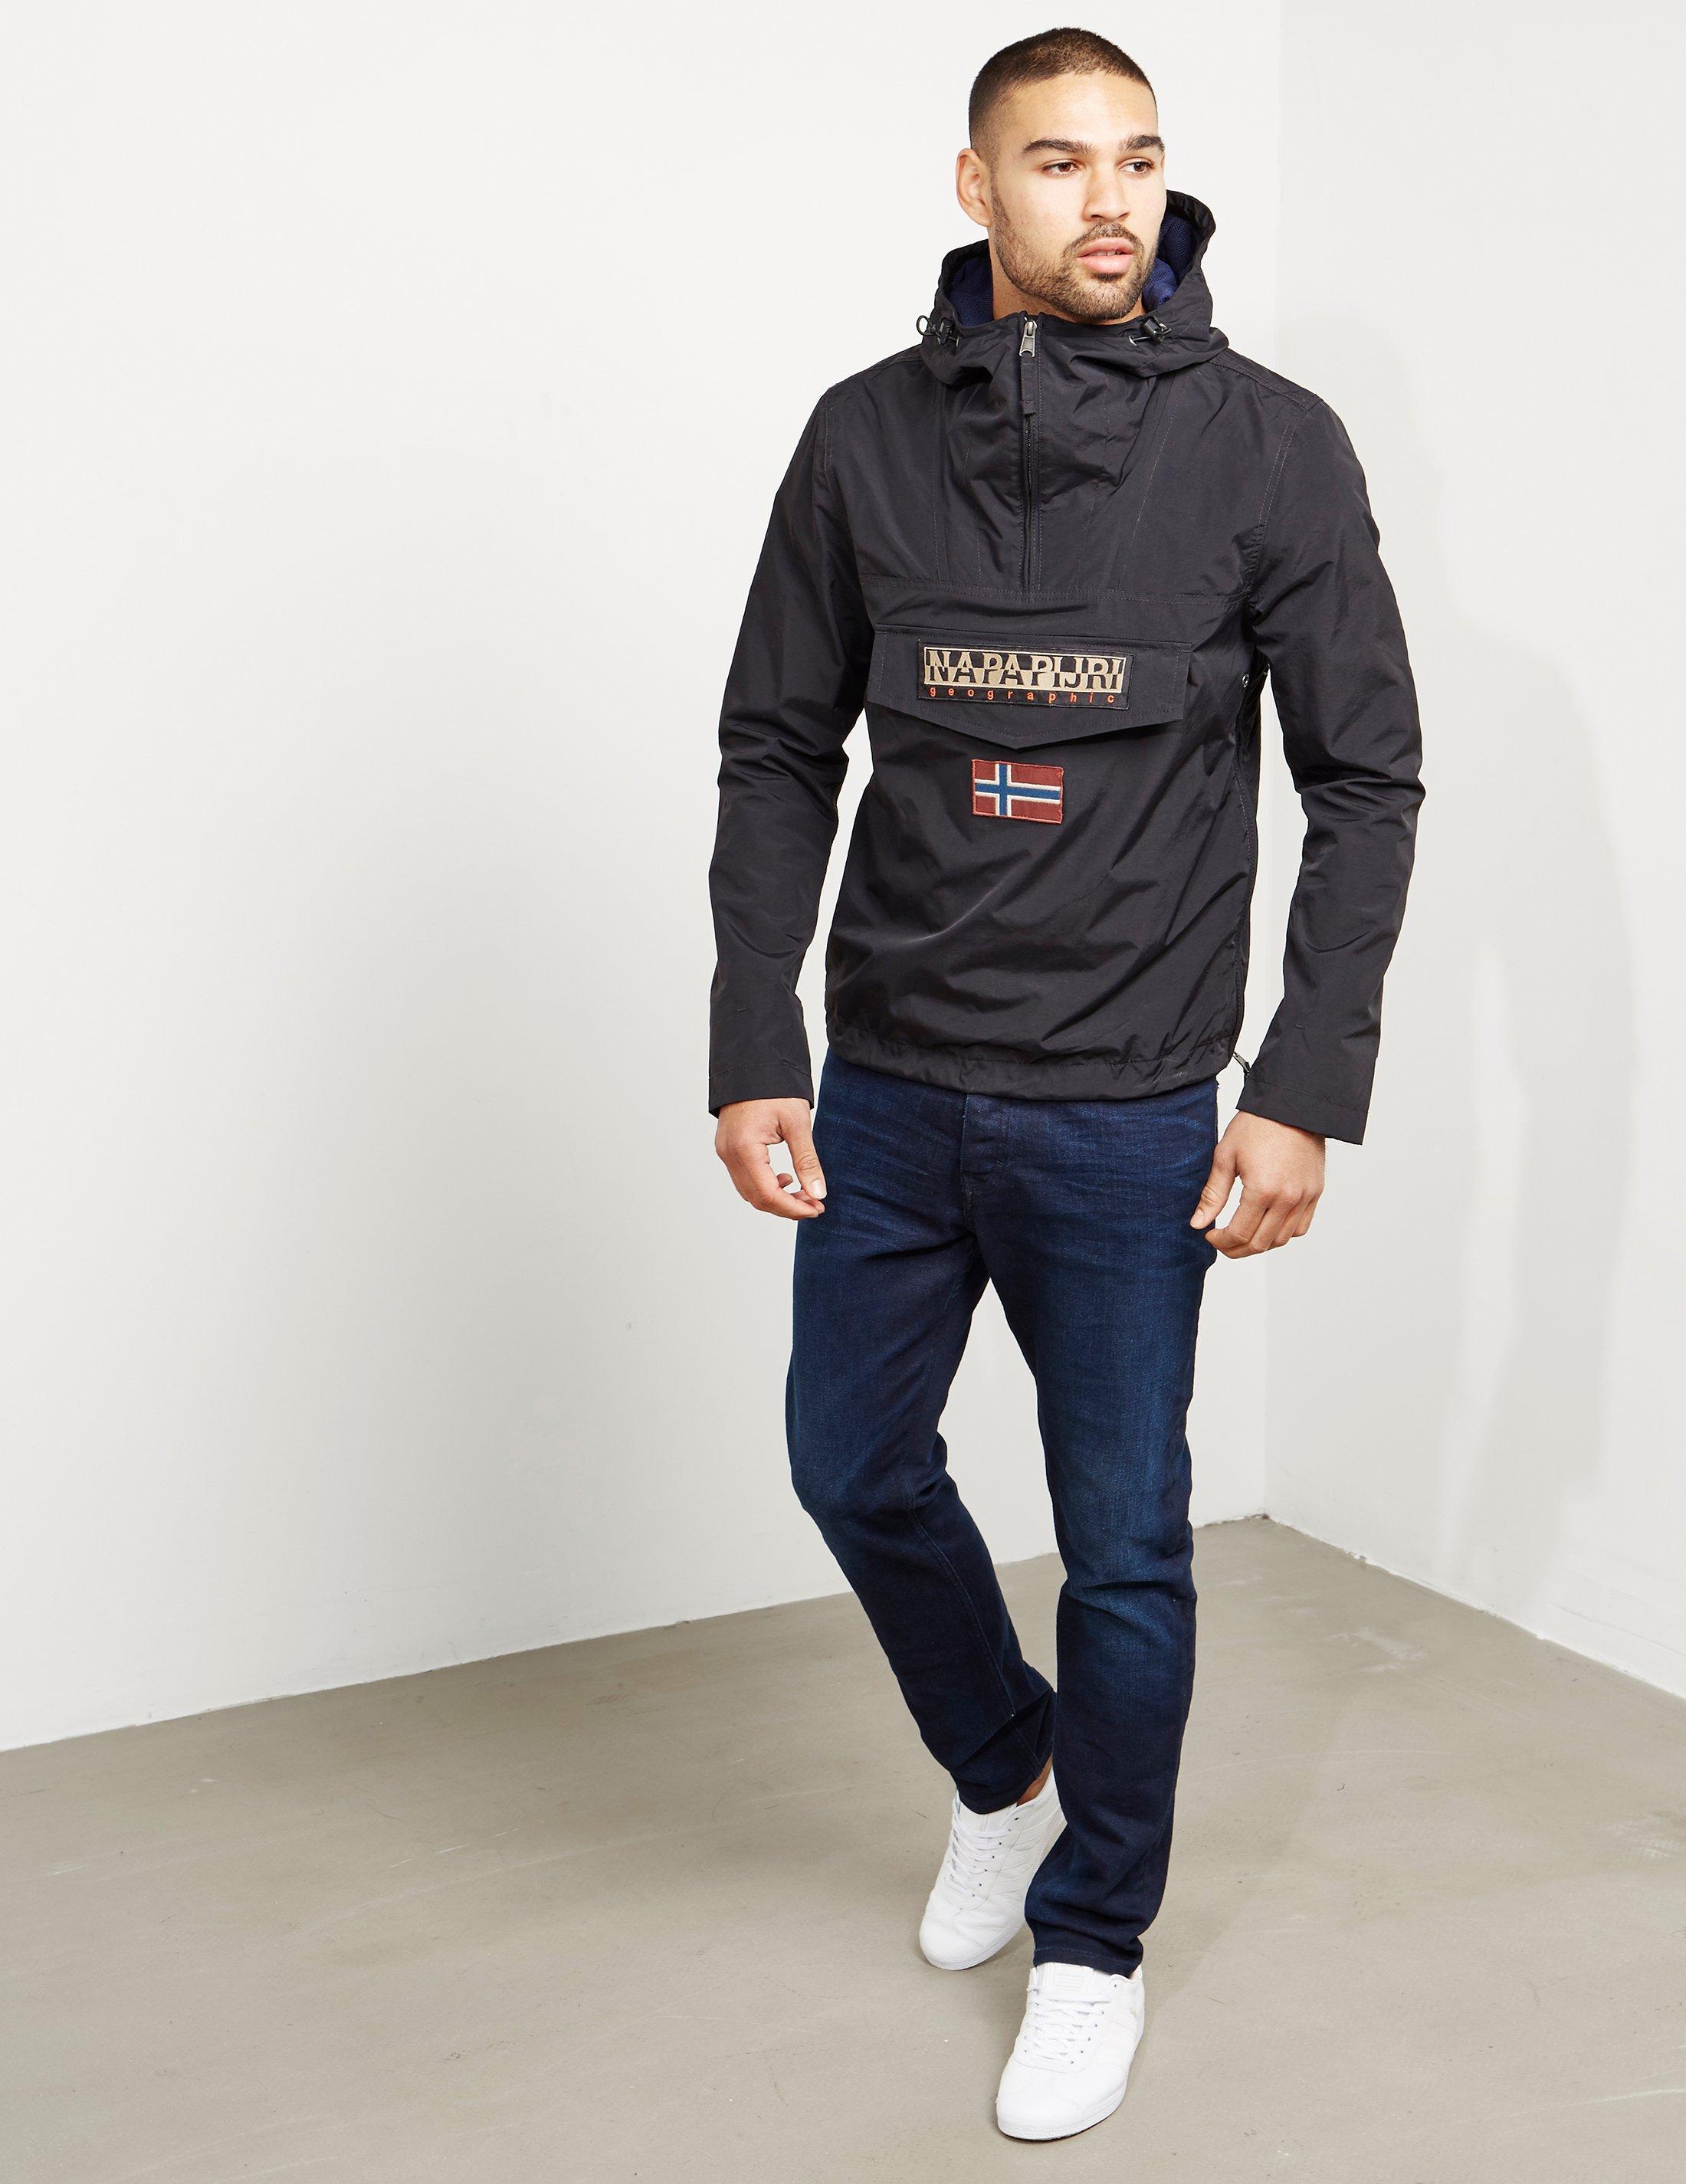 Lyst - Napapijri Rainforest Lightweight Jacket in Black for Men ac4d13cbeff